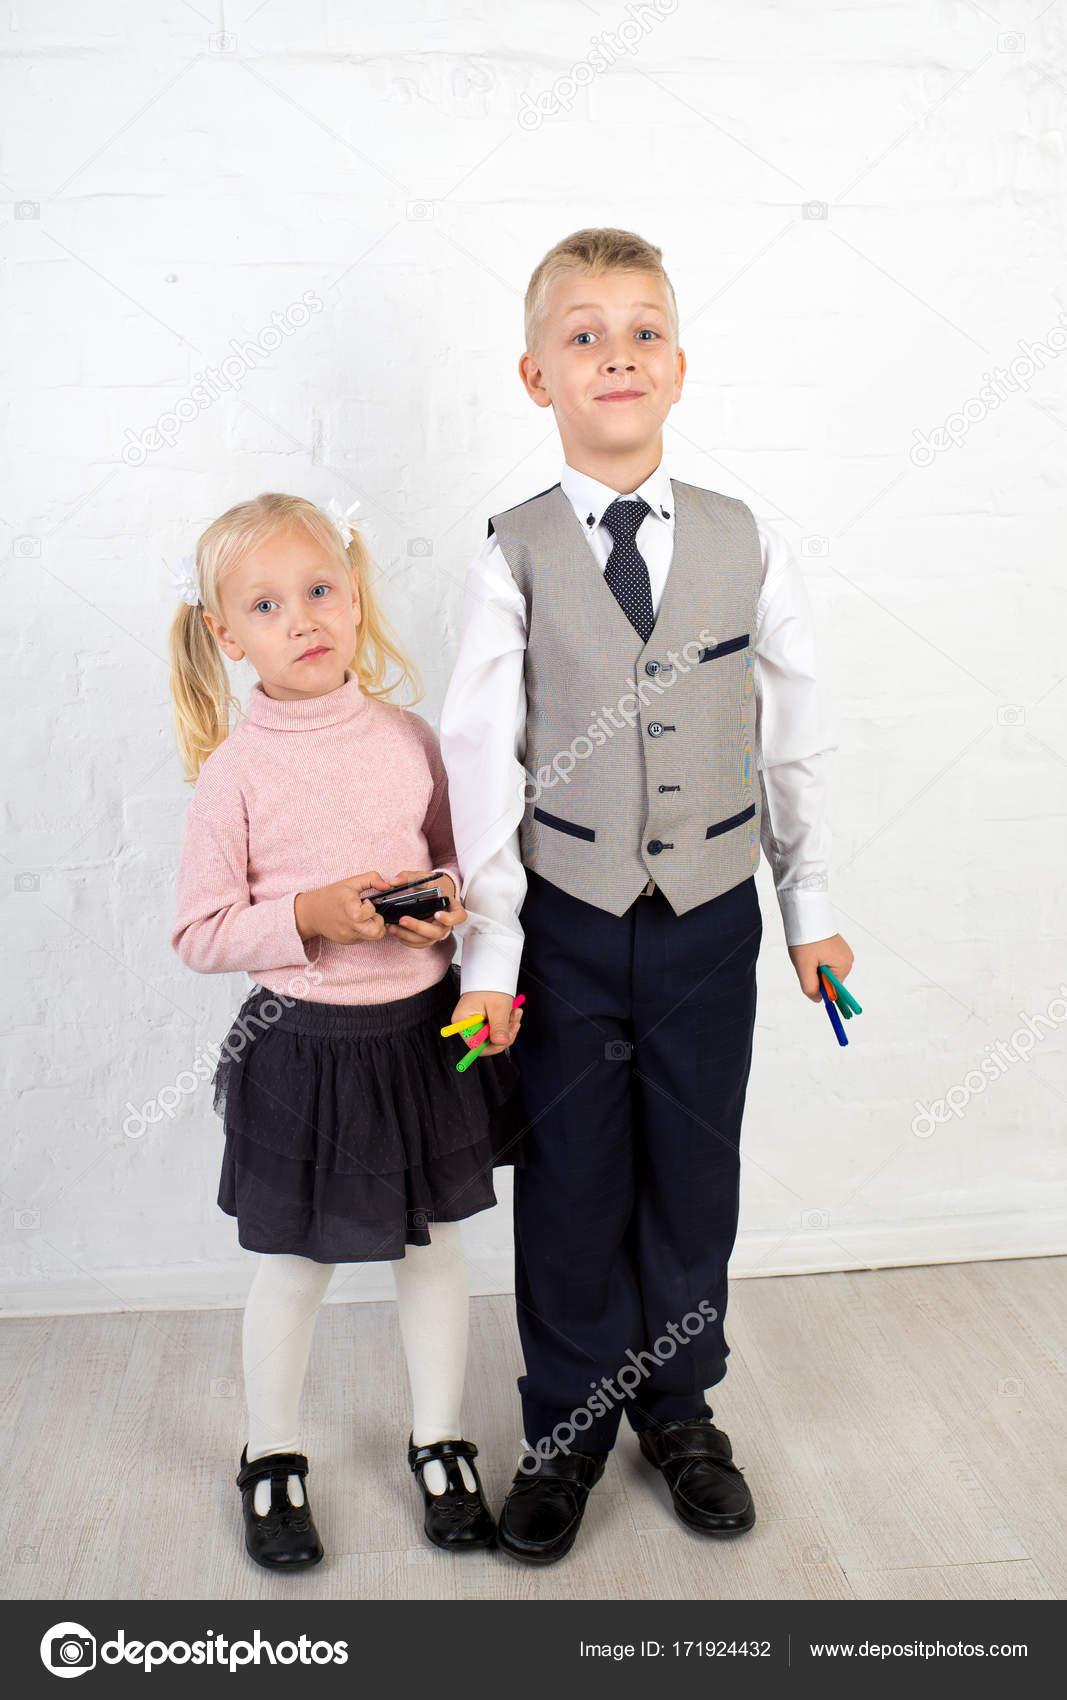 8a86e319fd2 παιδιά αγόρι κορίτσι — Φωτογραφία Αρχείου © OlgaOsa #171924432